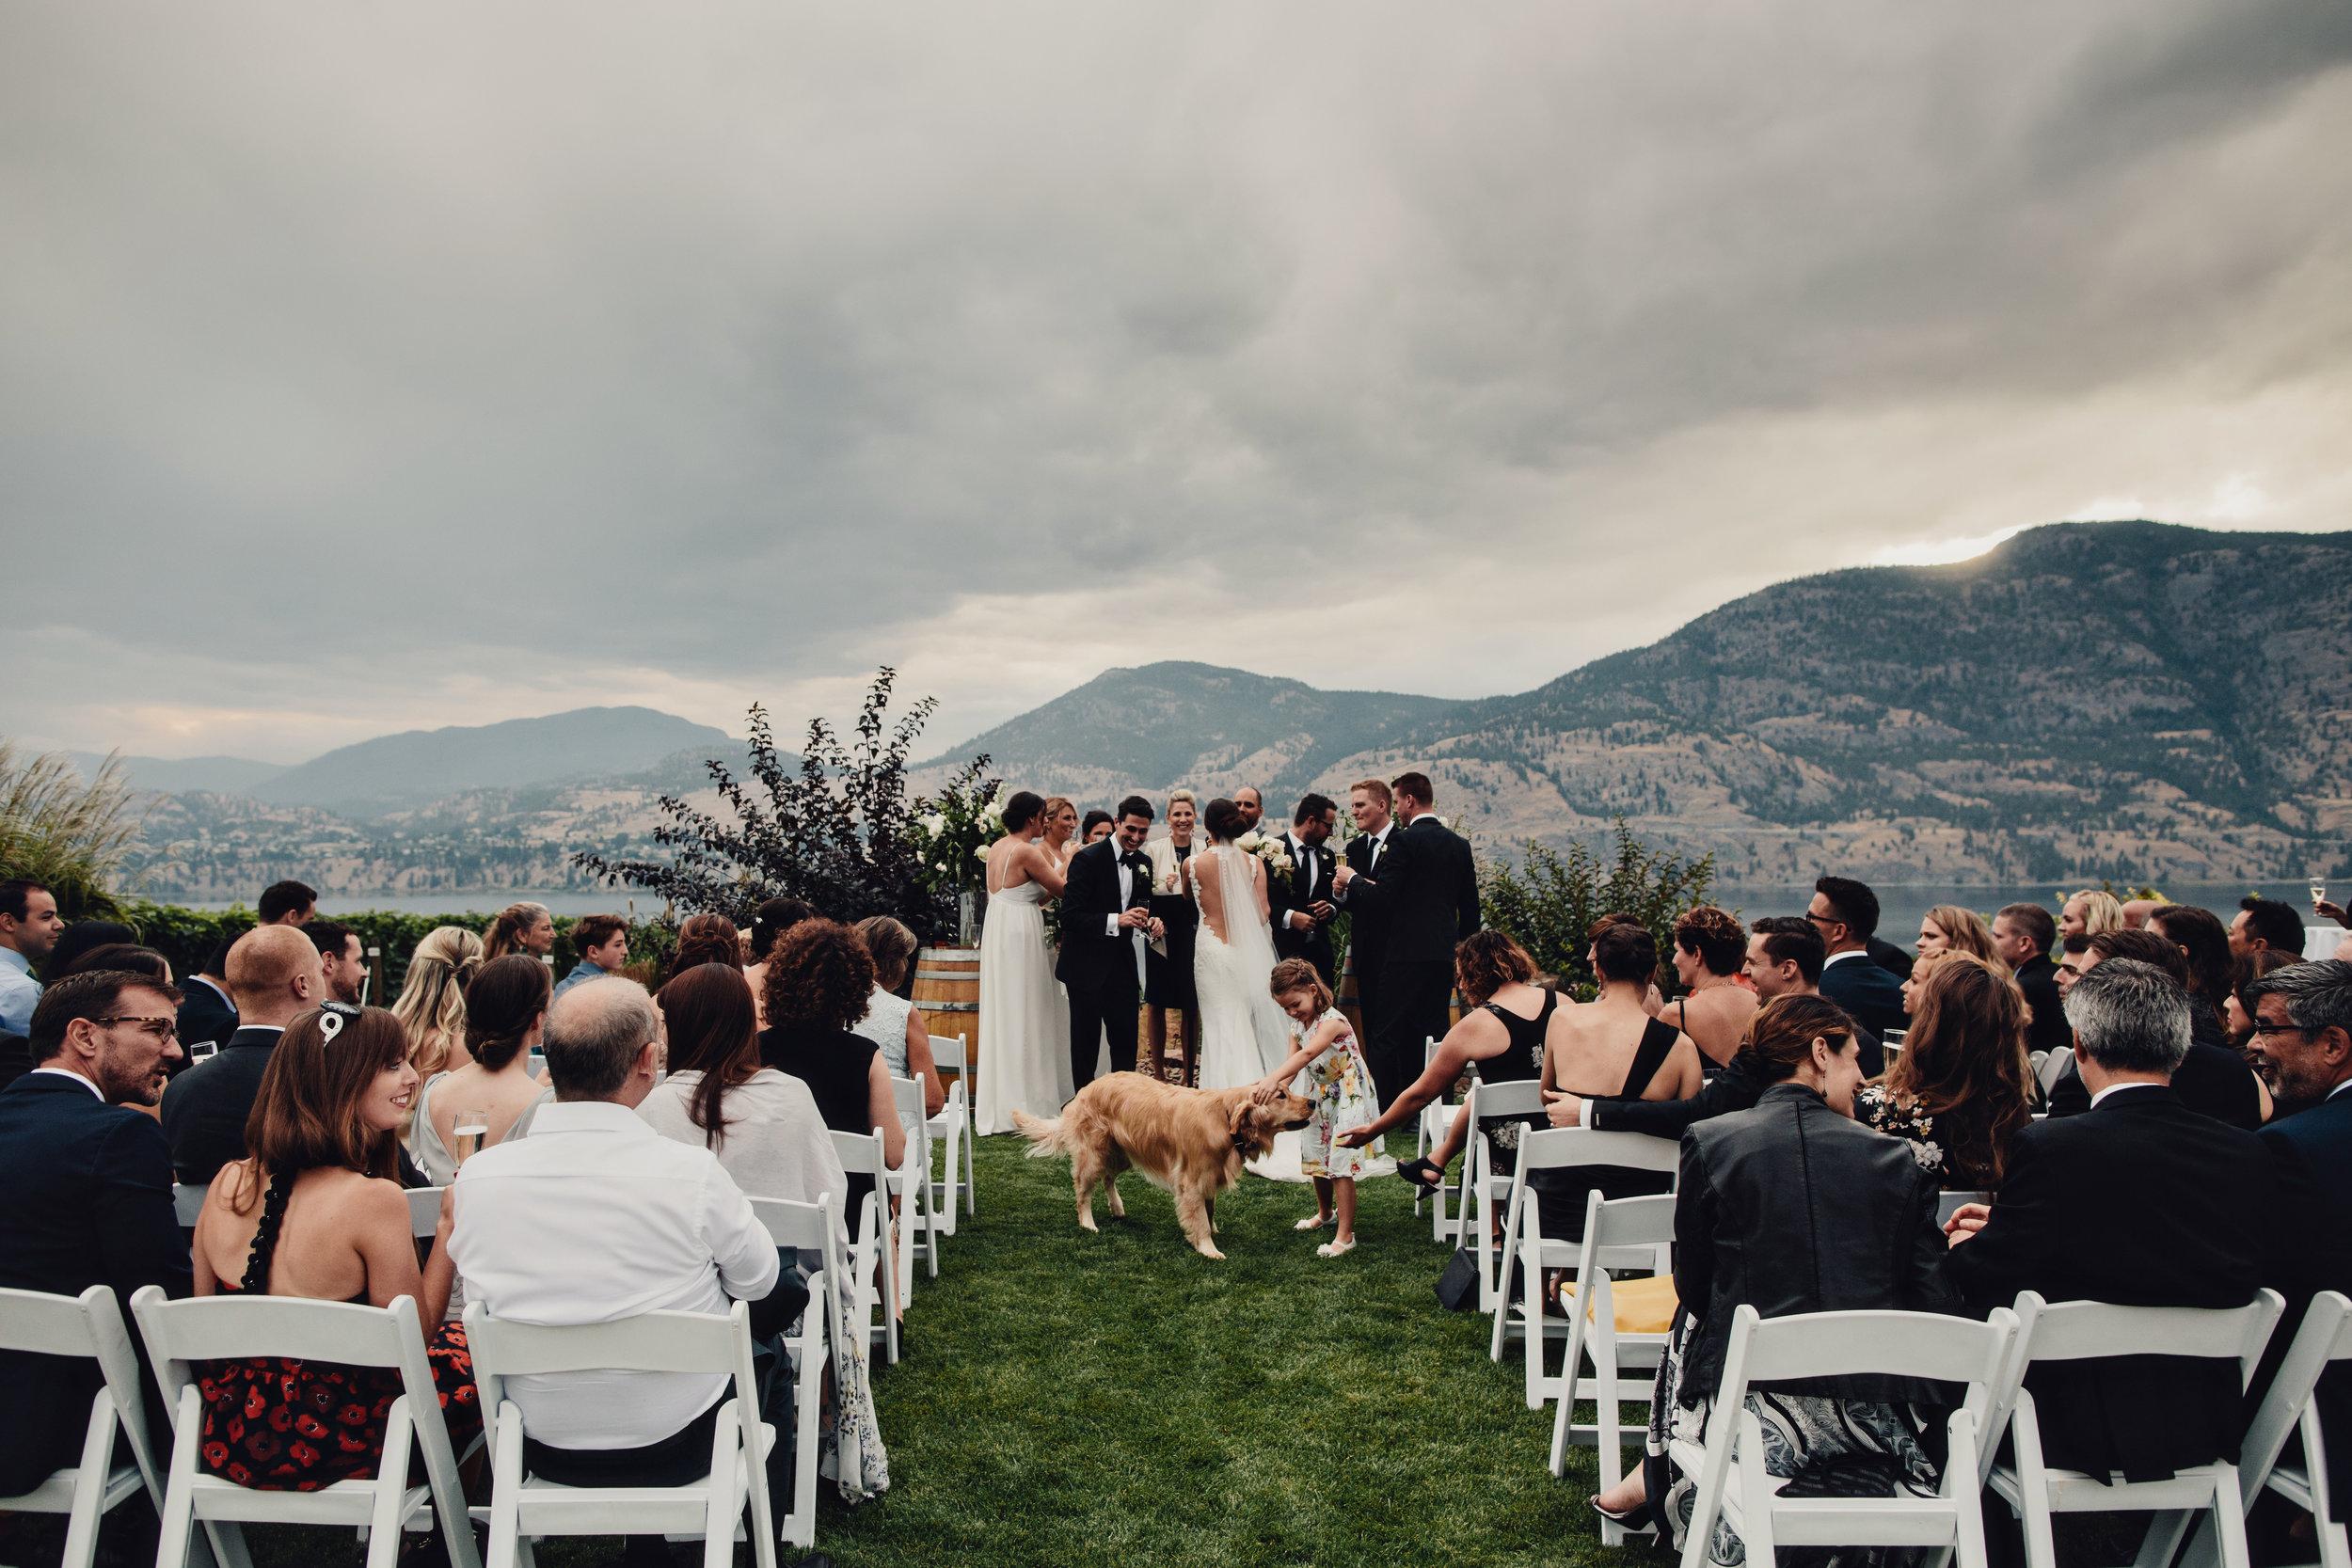 taylor-roades-wedding-0244.JPG